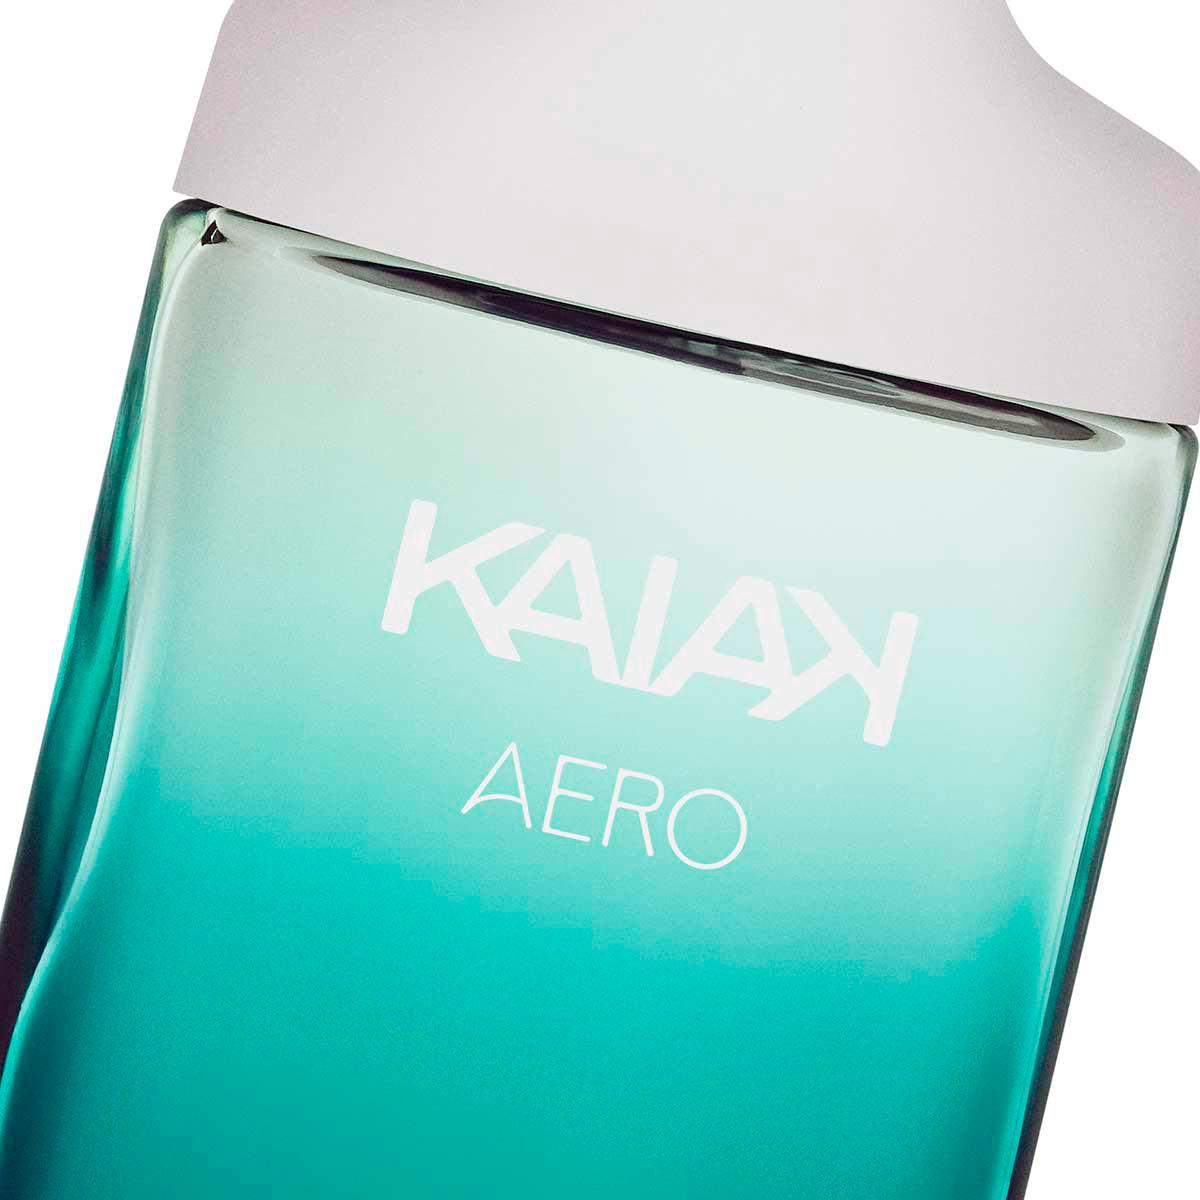 Desodorante Colônia Kaiak Aero Masculino - 100ml - 69124